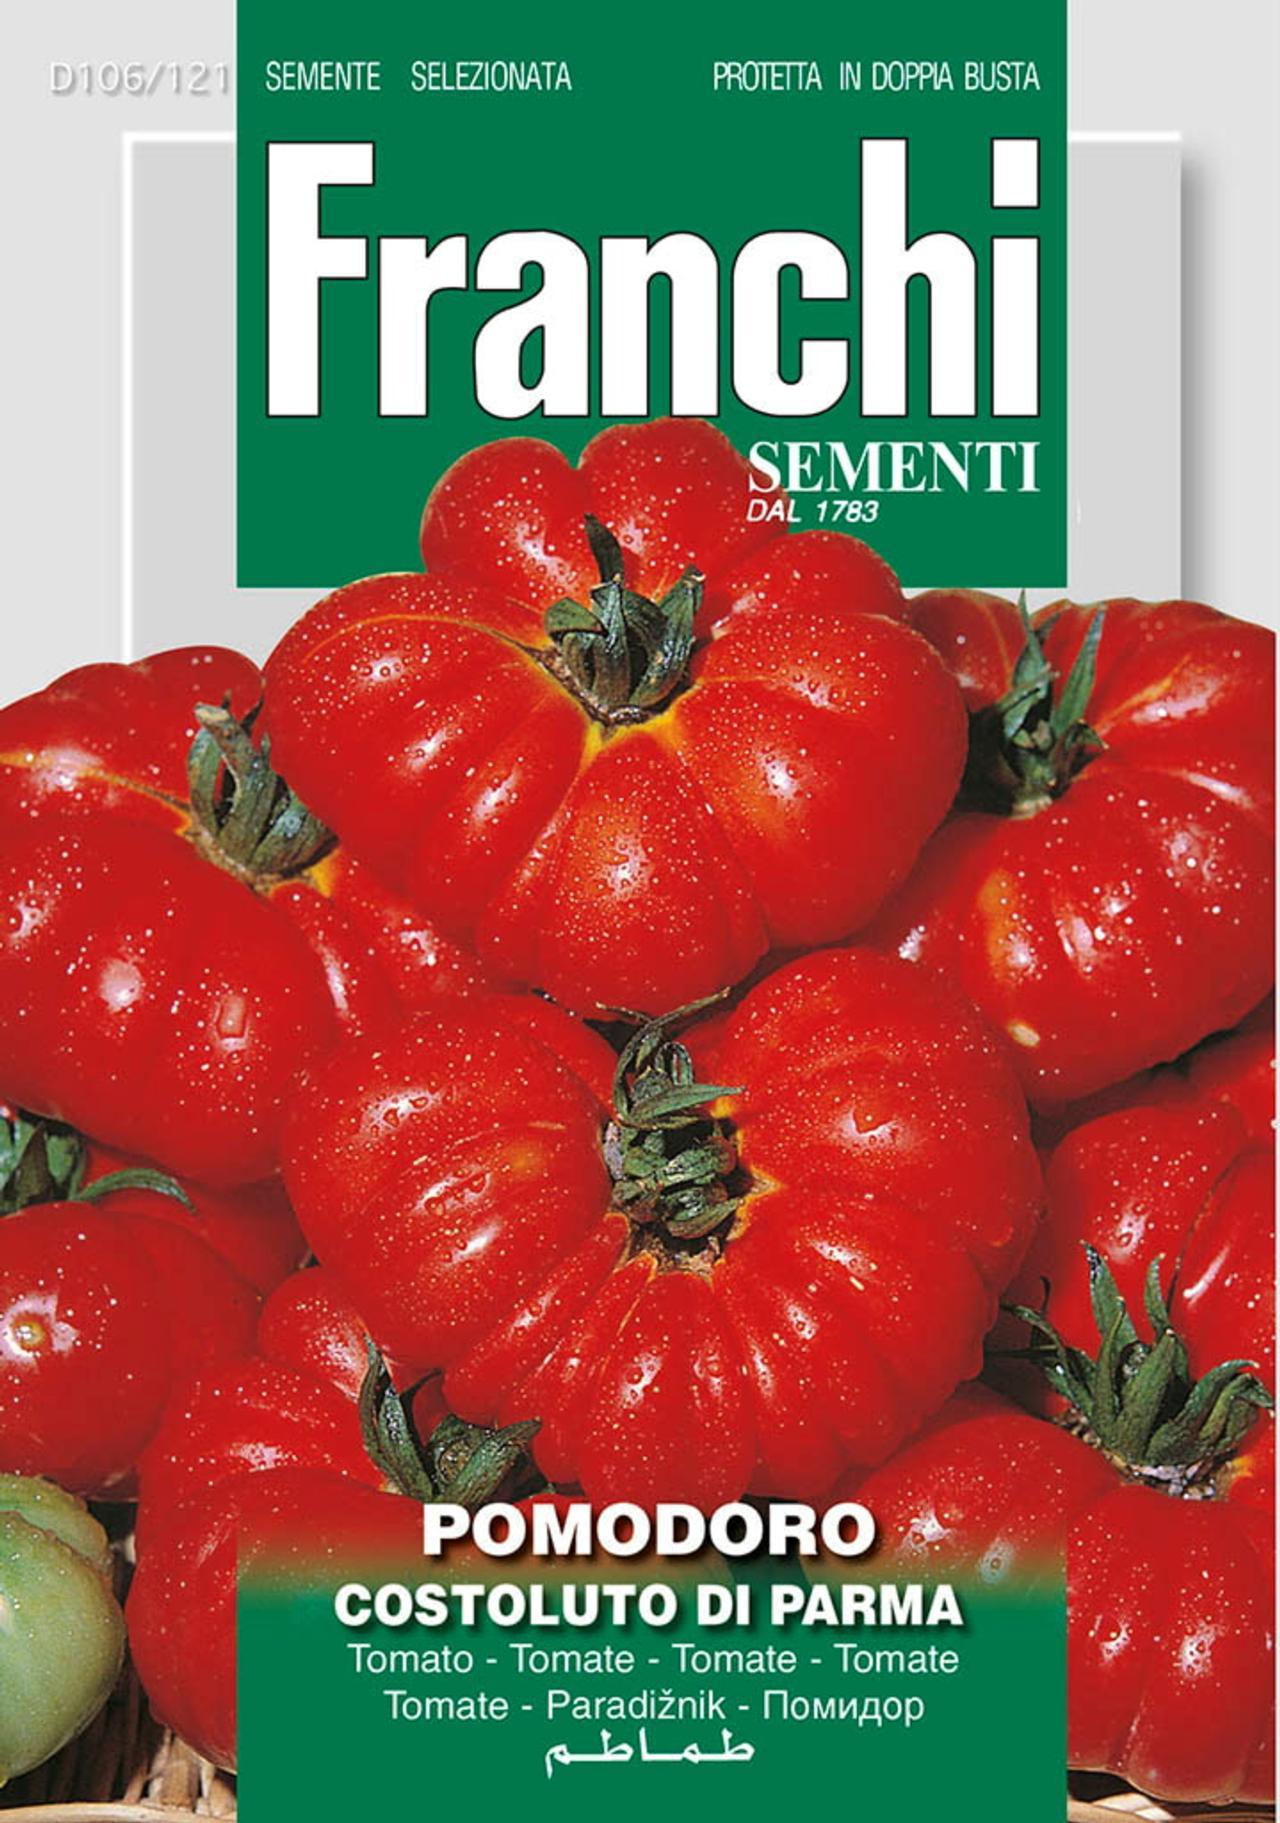 Solanum lycopersicum 'Costoluto de Parma' plant